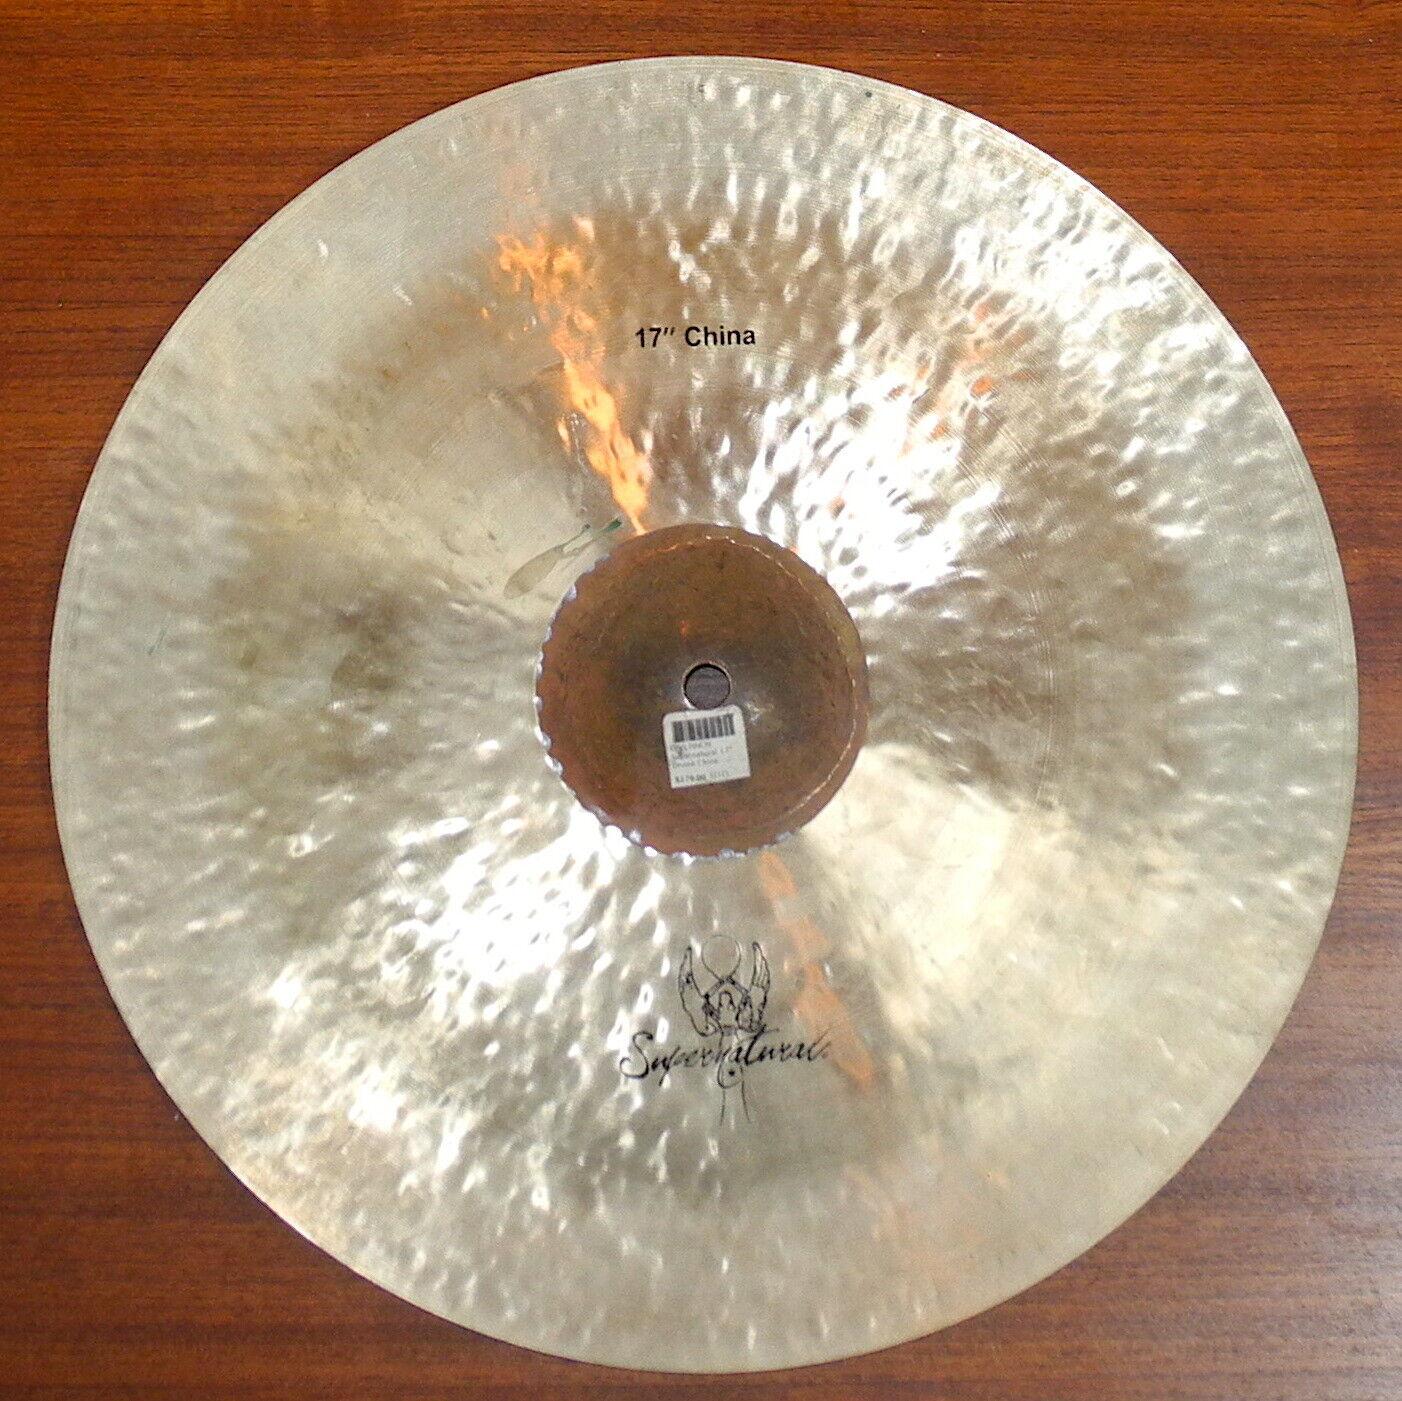 Supernaturals 17 Inch Divine China Drum Cymbal - $79.99